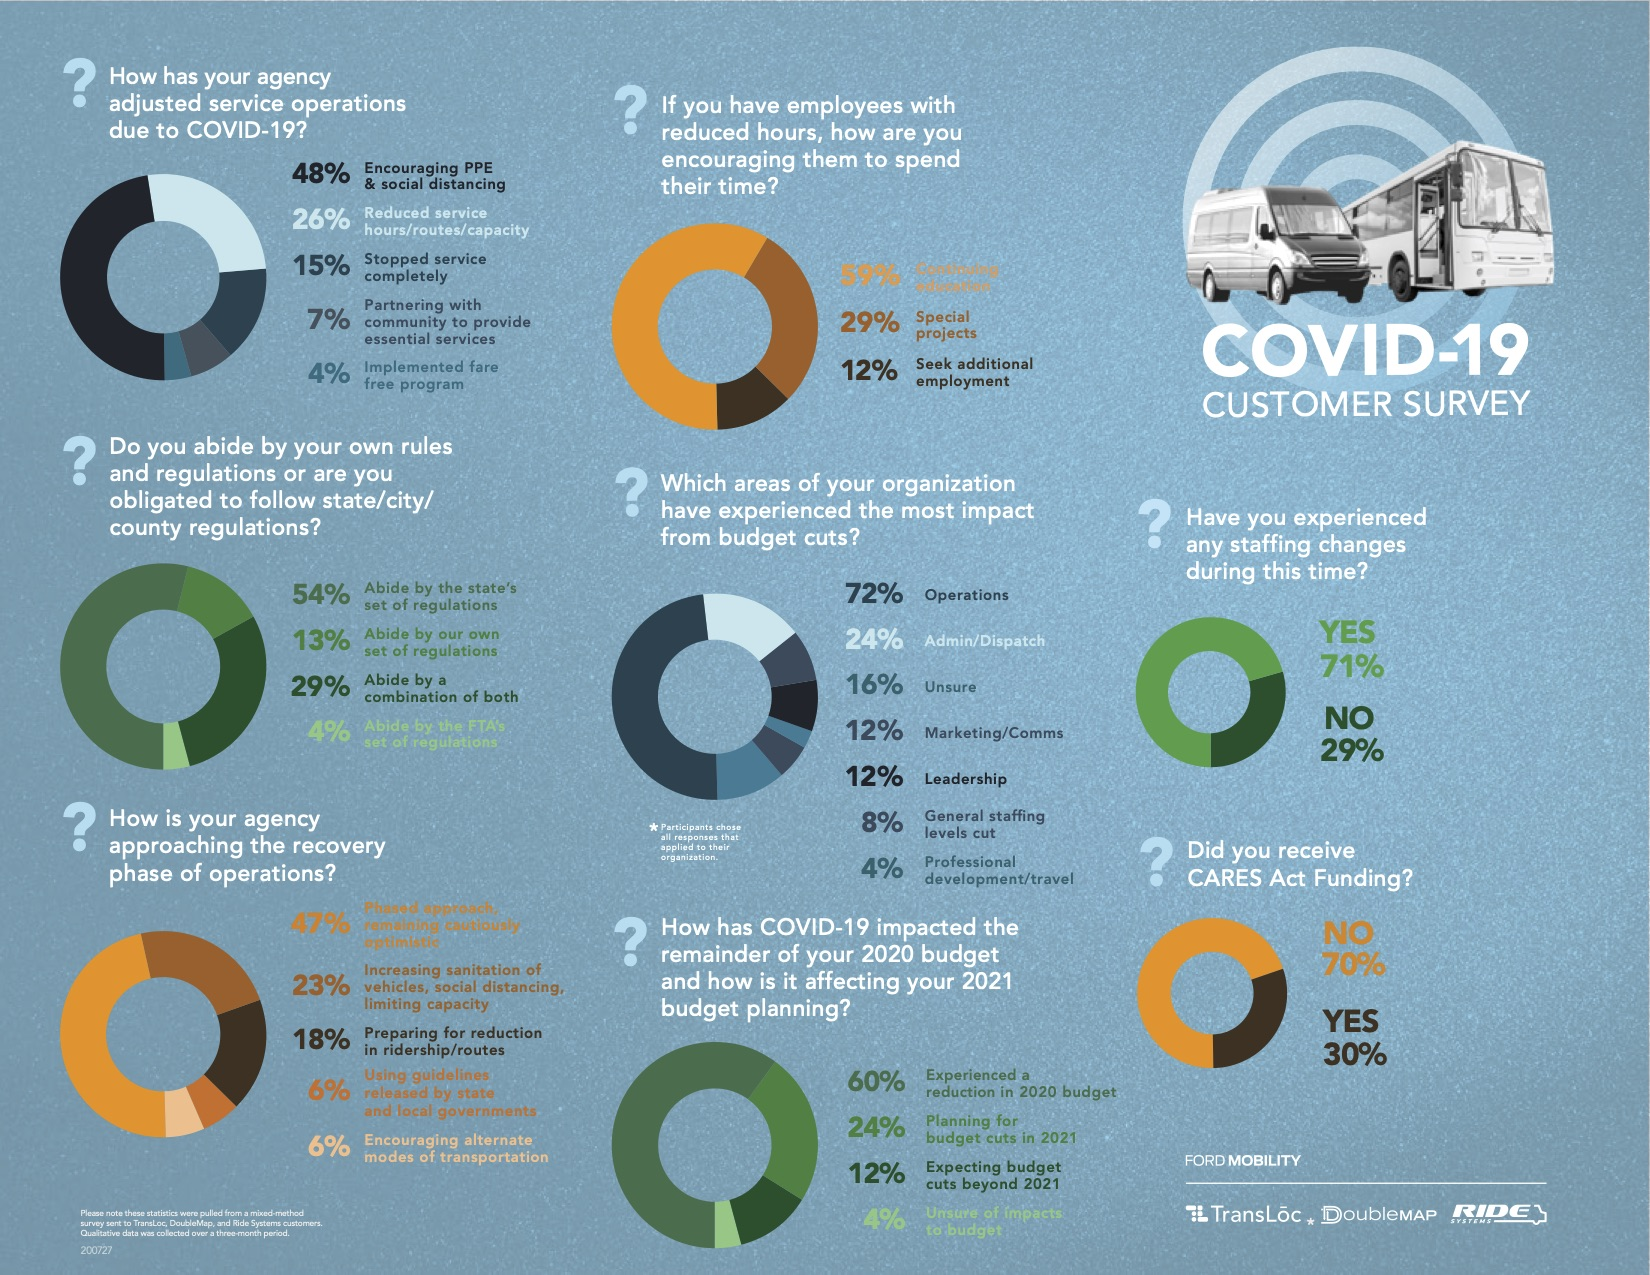 200728_Infographic_COVID19_Survey